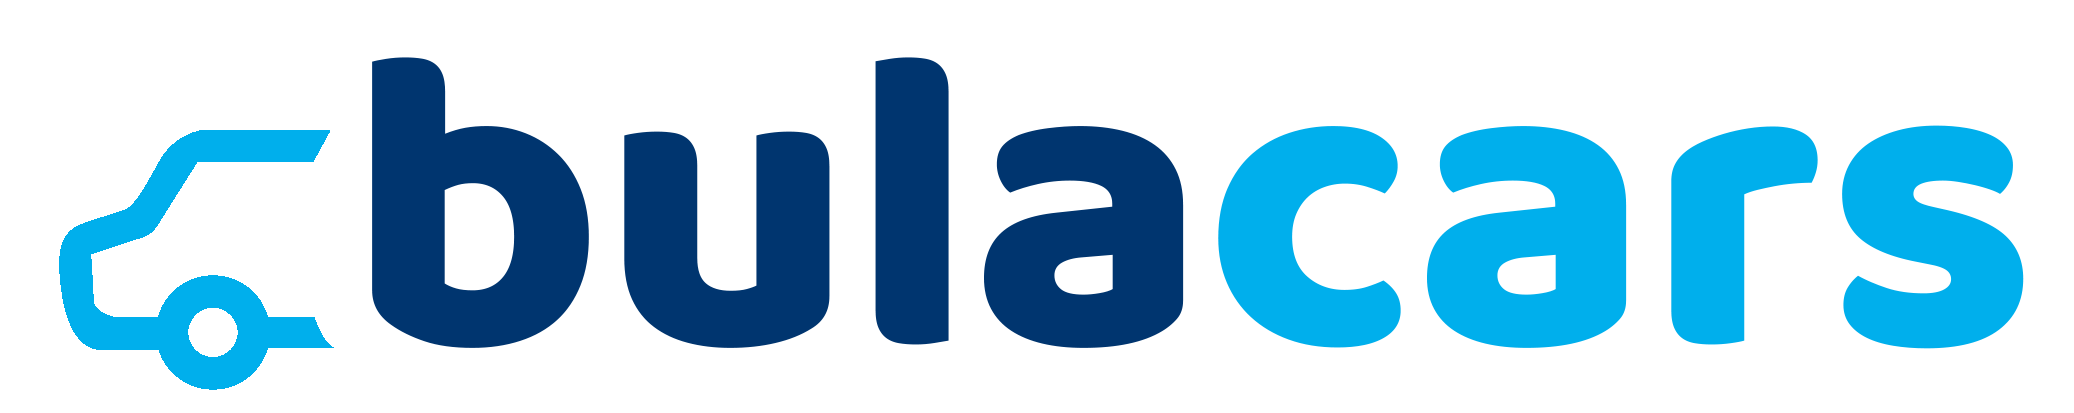 Bulacars logo